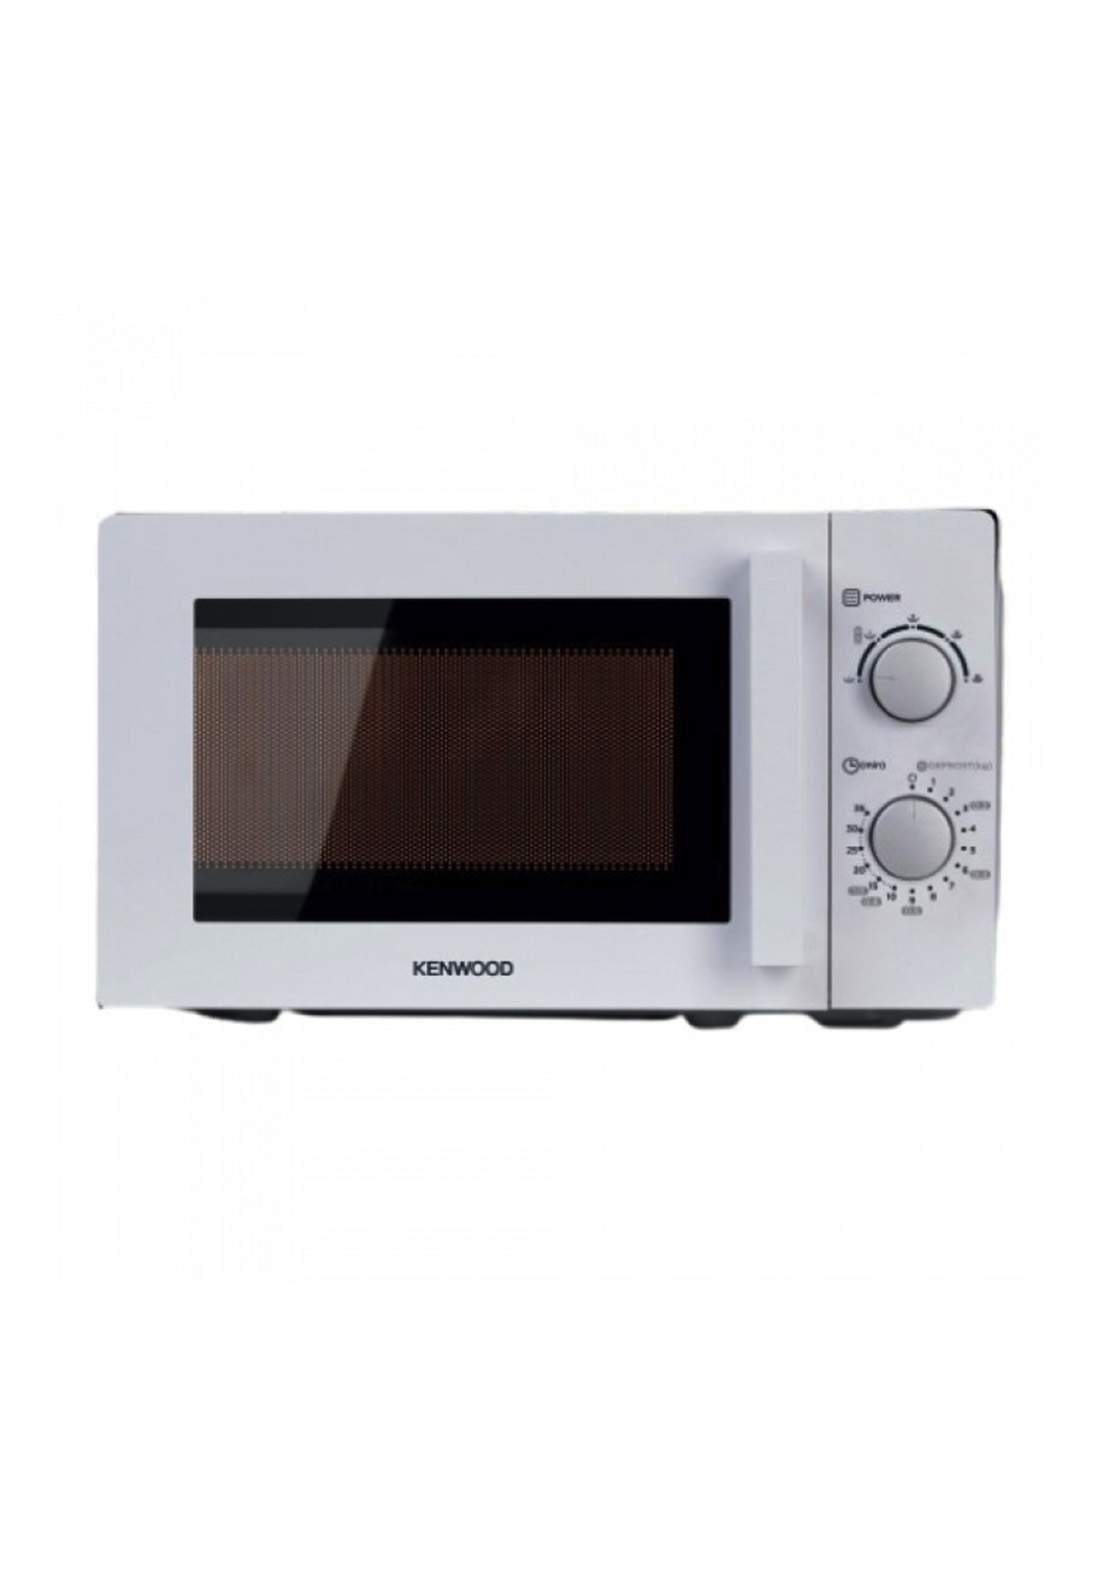 Kenwood MWM20.000WH  Microwave Oven  مايكروويف طعام